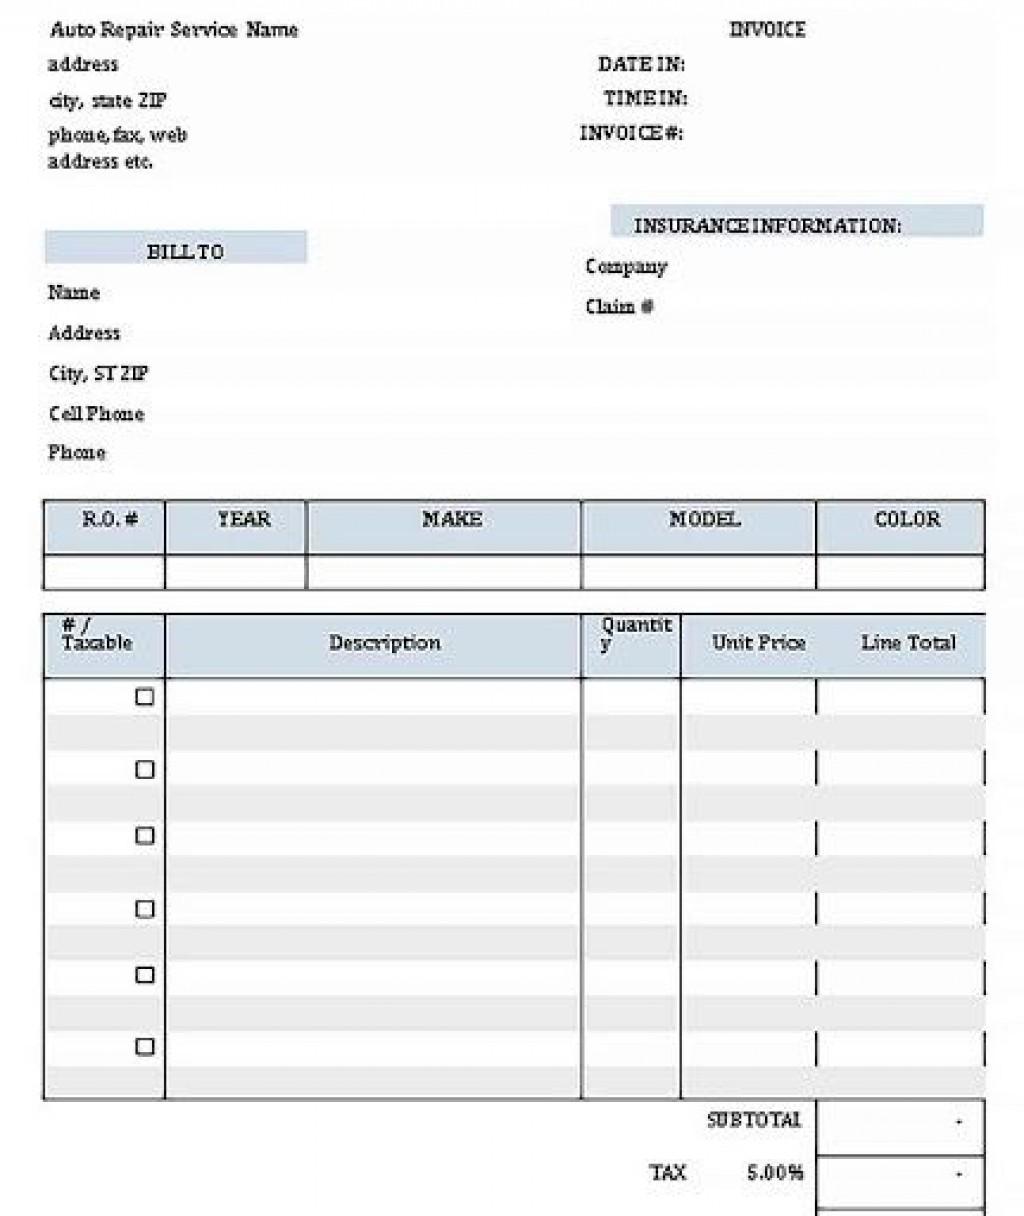 001 Wonderful Auto Repair Order Template Highest Clarity  Work Free Automotive CarLarge